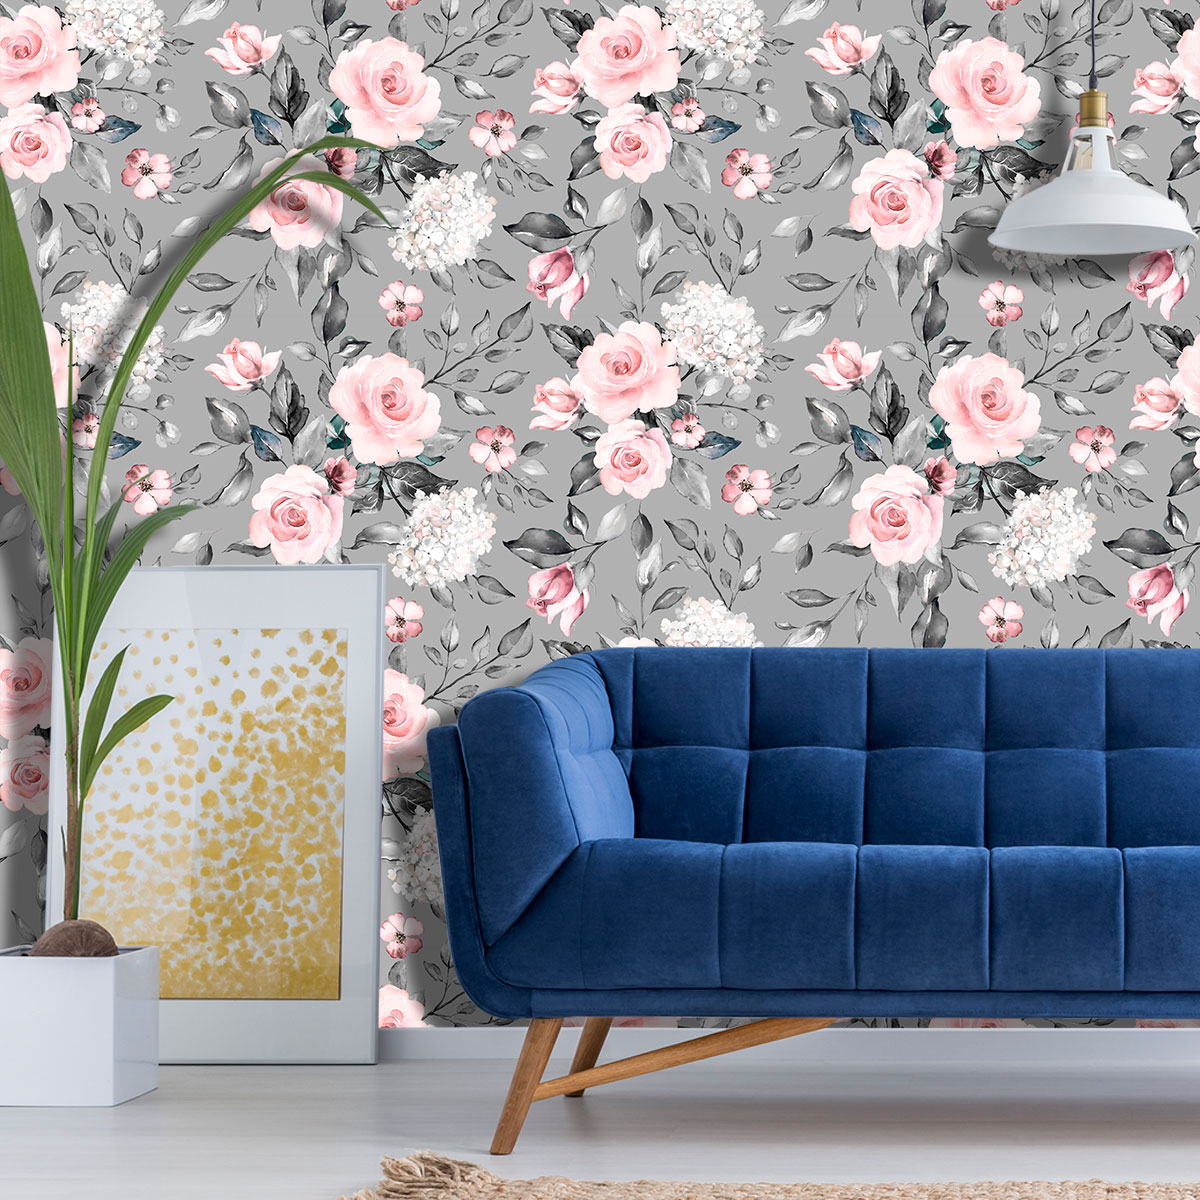 Papel de Parede Floral Rosas Branca Glamour Adesivo